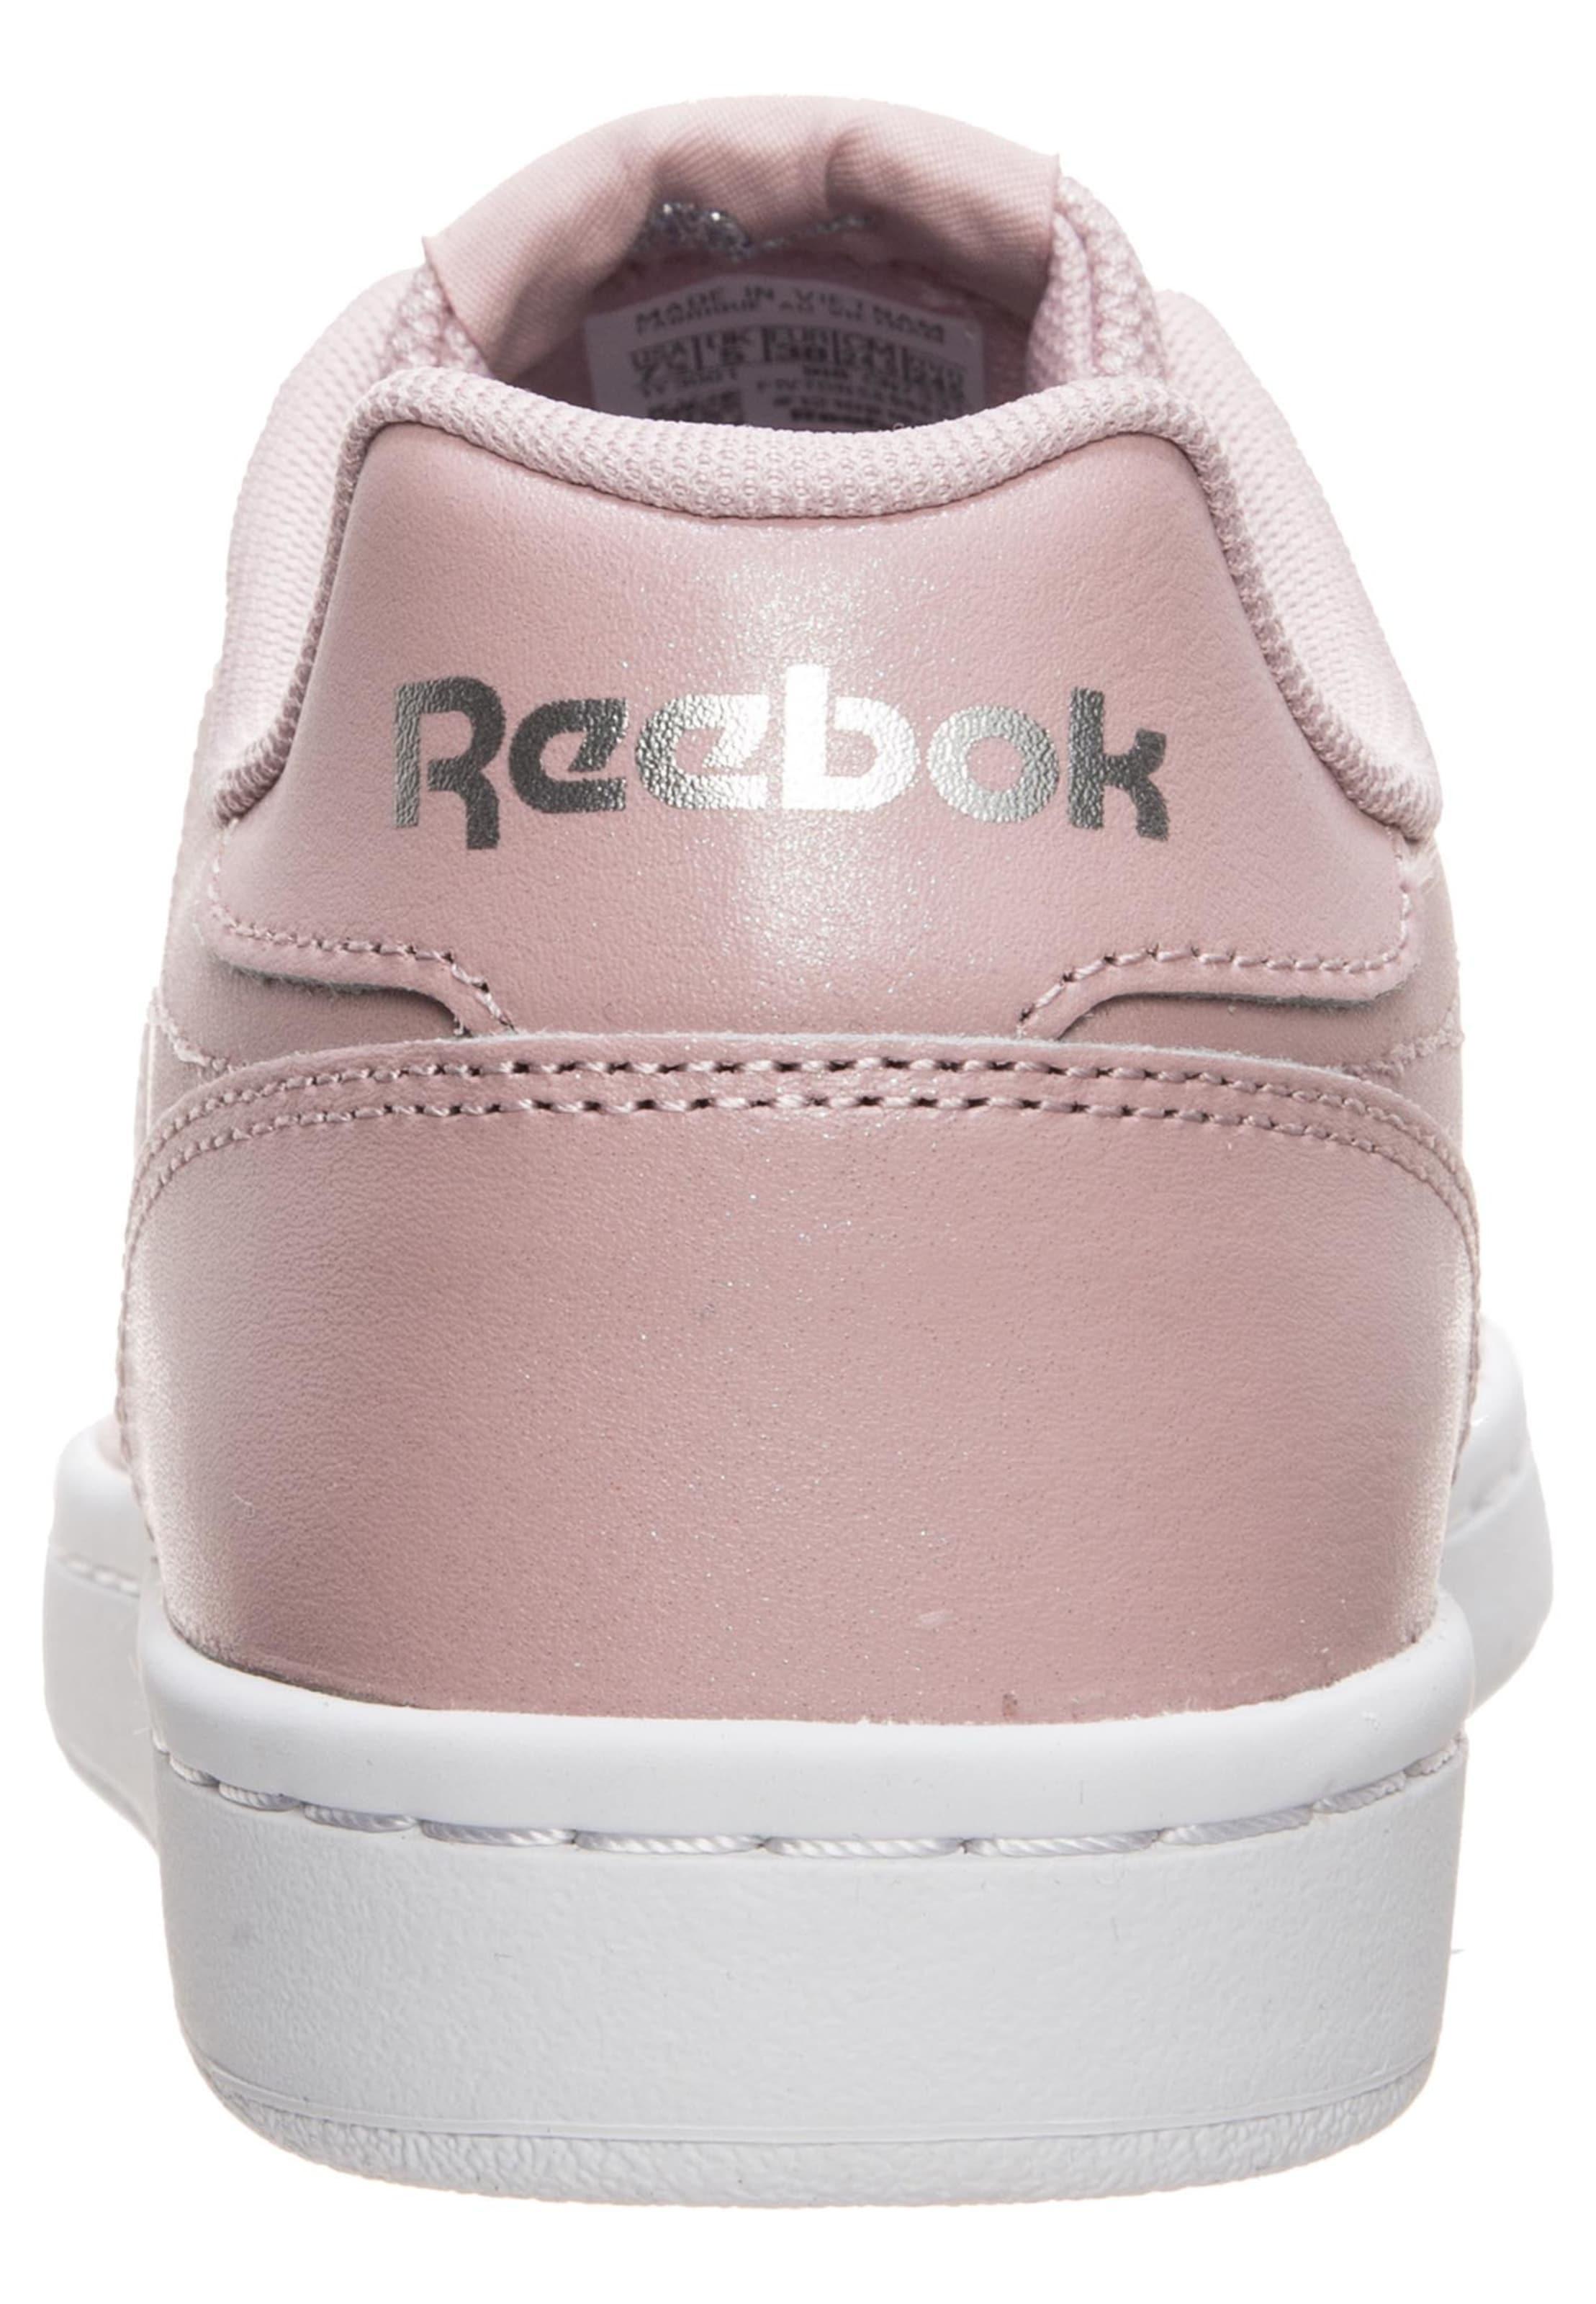 Reebok Basses Classic RoseBlanc Baskets En NnXOk80Pw